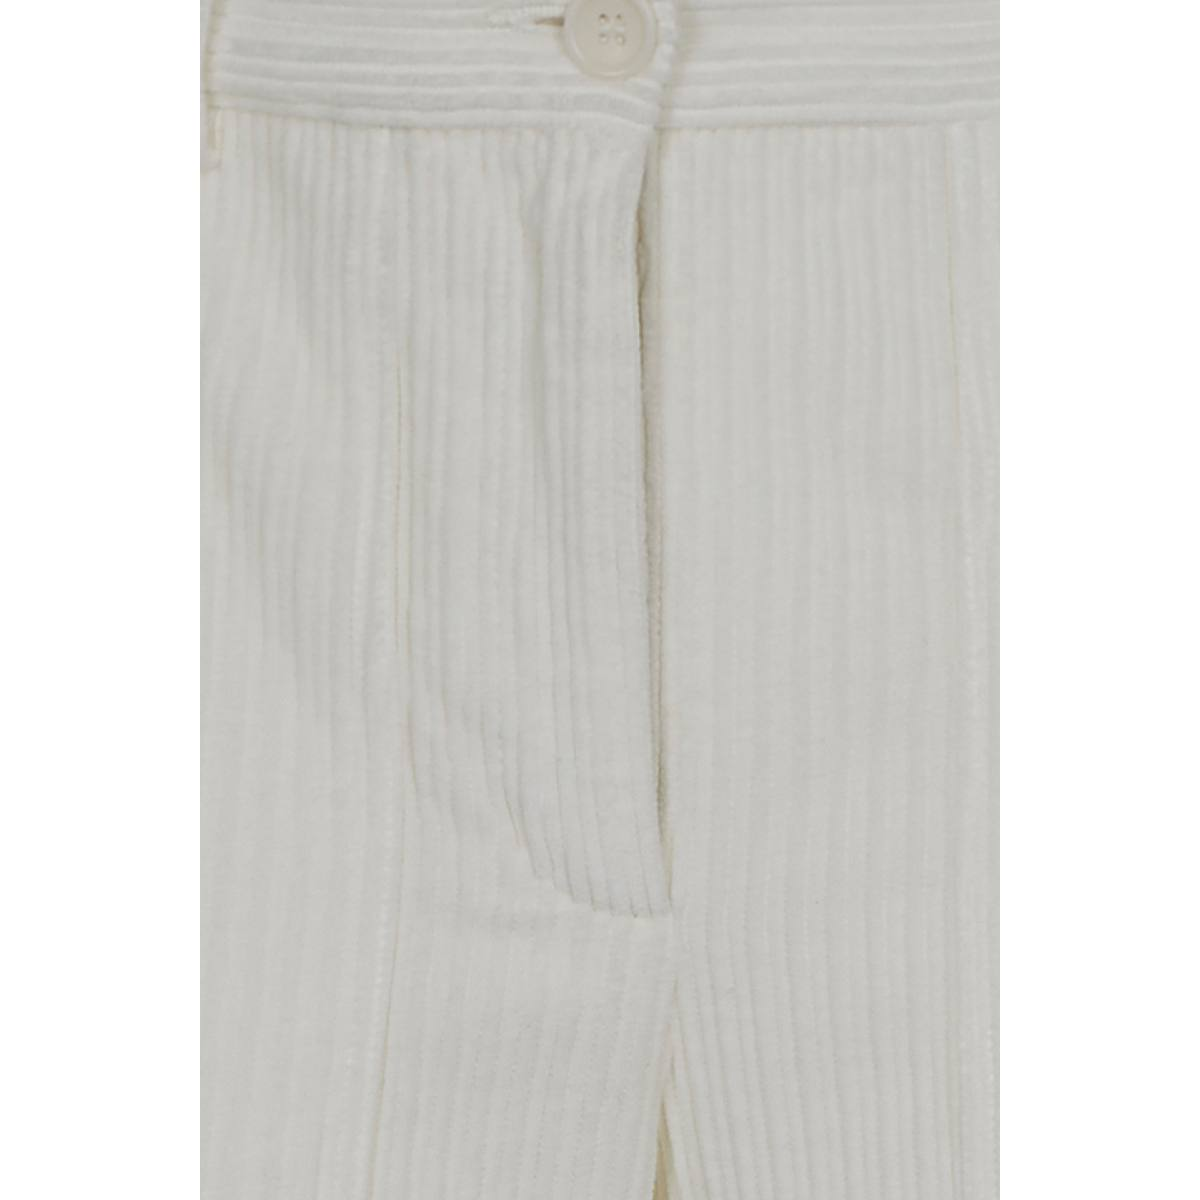 Pradol Corduroy Trousers Trousers by Hartford   Restoration Yard